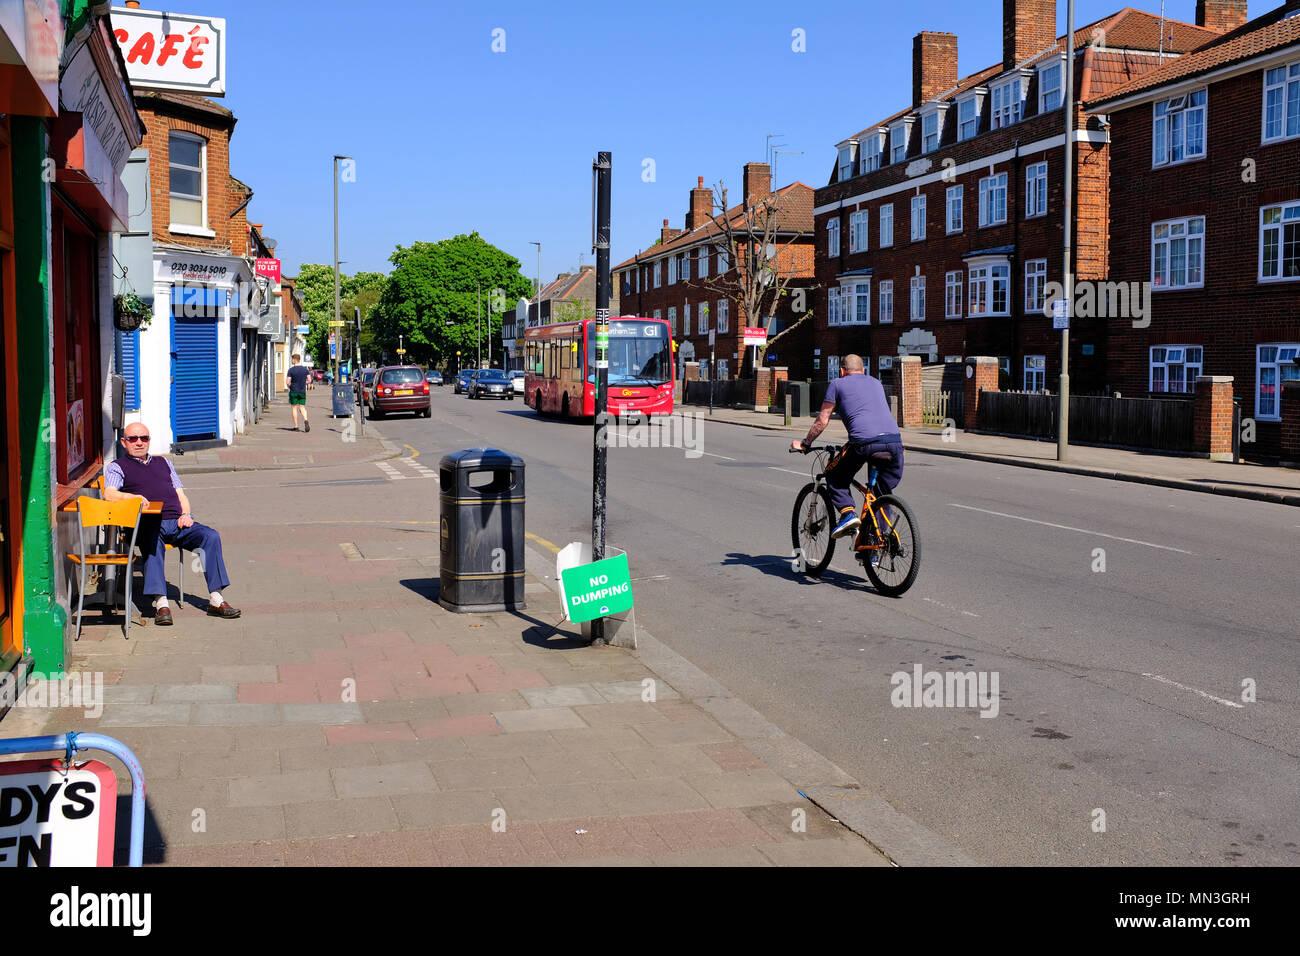 Garratt Lane Tooting London SW17 - Stock Image